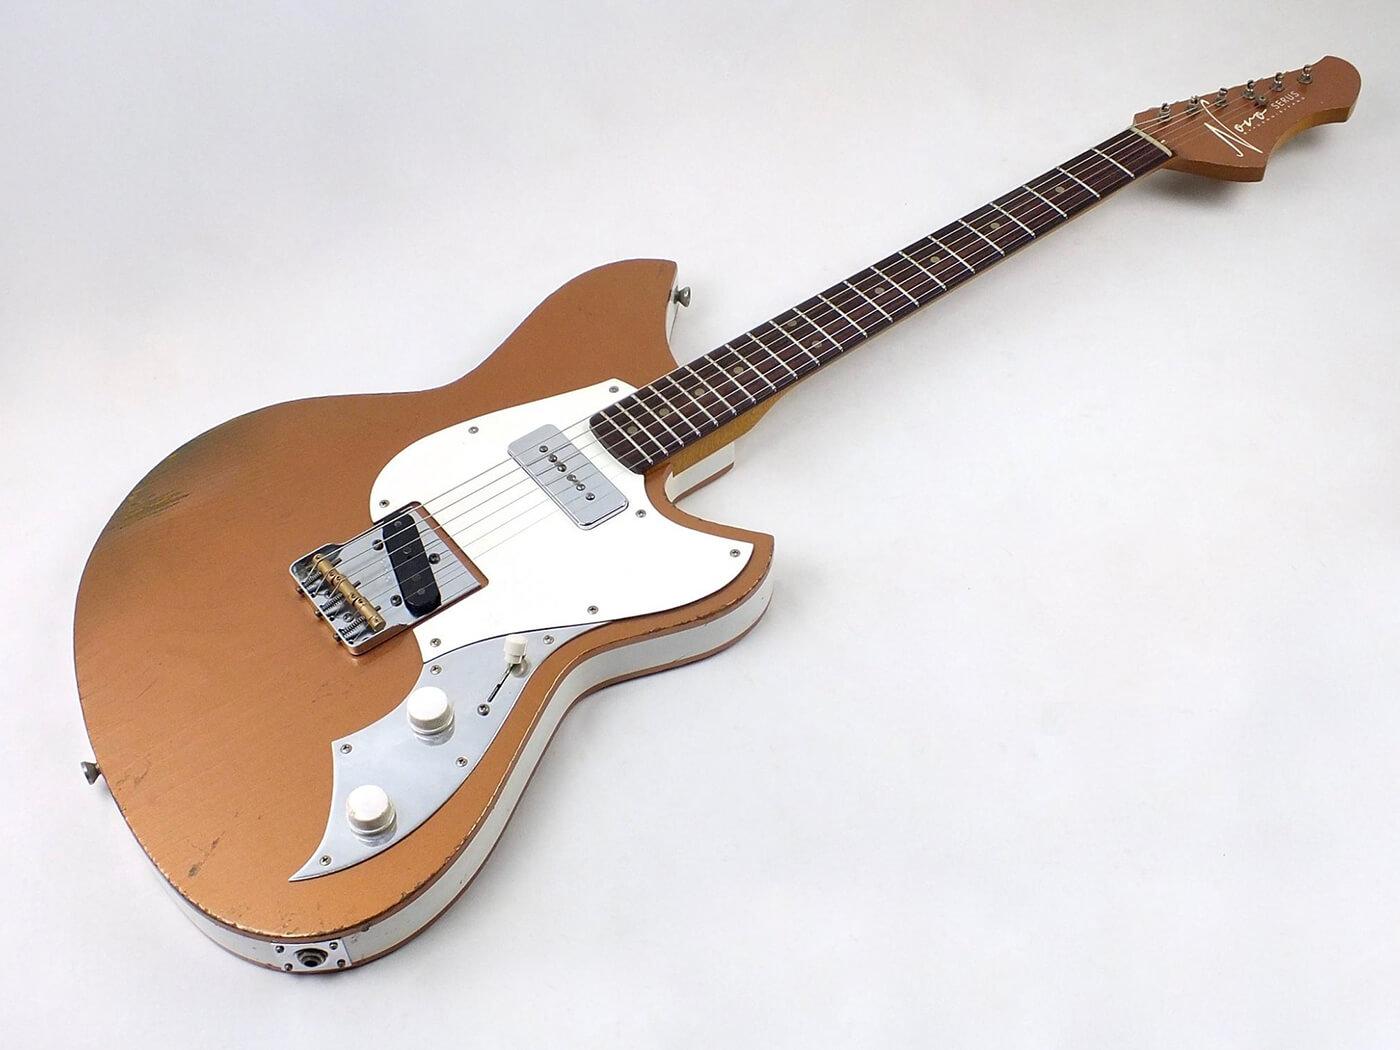 3X Vintage Style Staggered AlNiCo V Guitar Pickups for ST Strat Electric Guitar